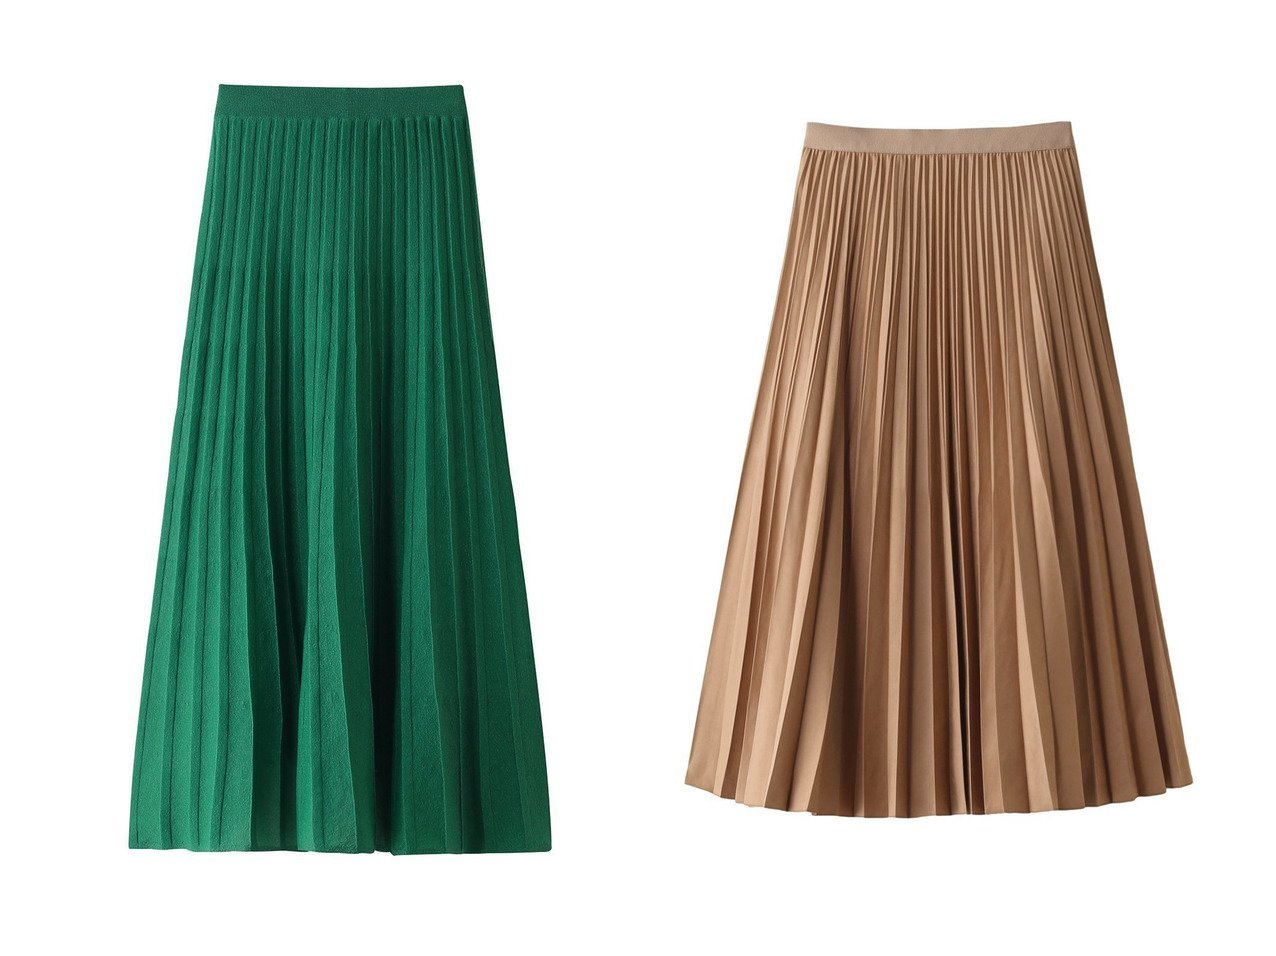 【ANAYI/アナイ】のソフトスエードチョウプリーツスカート&【Shinzone/シンゾーン】のプリーツニットスカート スカートのおすすめ!人気、トレンド・レディースファッションの通販 おすすめで人気の流行・トレンド、ファッションの通販商品 メンズファッション・キッズファッション・インテリア・家具・レディースファッション・服の通販 founy(ファニー) https://founy.com/ ファッション Fashion レディースファッション WOMEN スカート Skirt プリーツスカート Pleated Skirts 2021年 2021 2021 春夏 S/S SS Spring/Summer 2021 S/S 春夏 SS Spring/Summer エアリー シンプル 春 Spring スエード プリーツ |ID:crp329100000012918